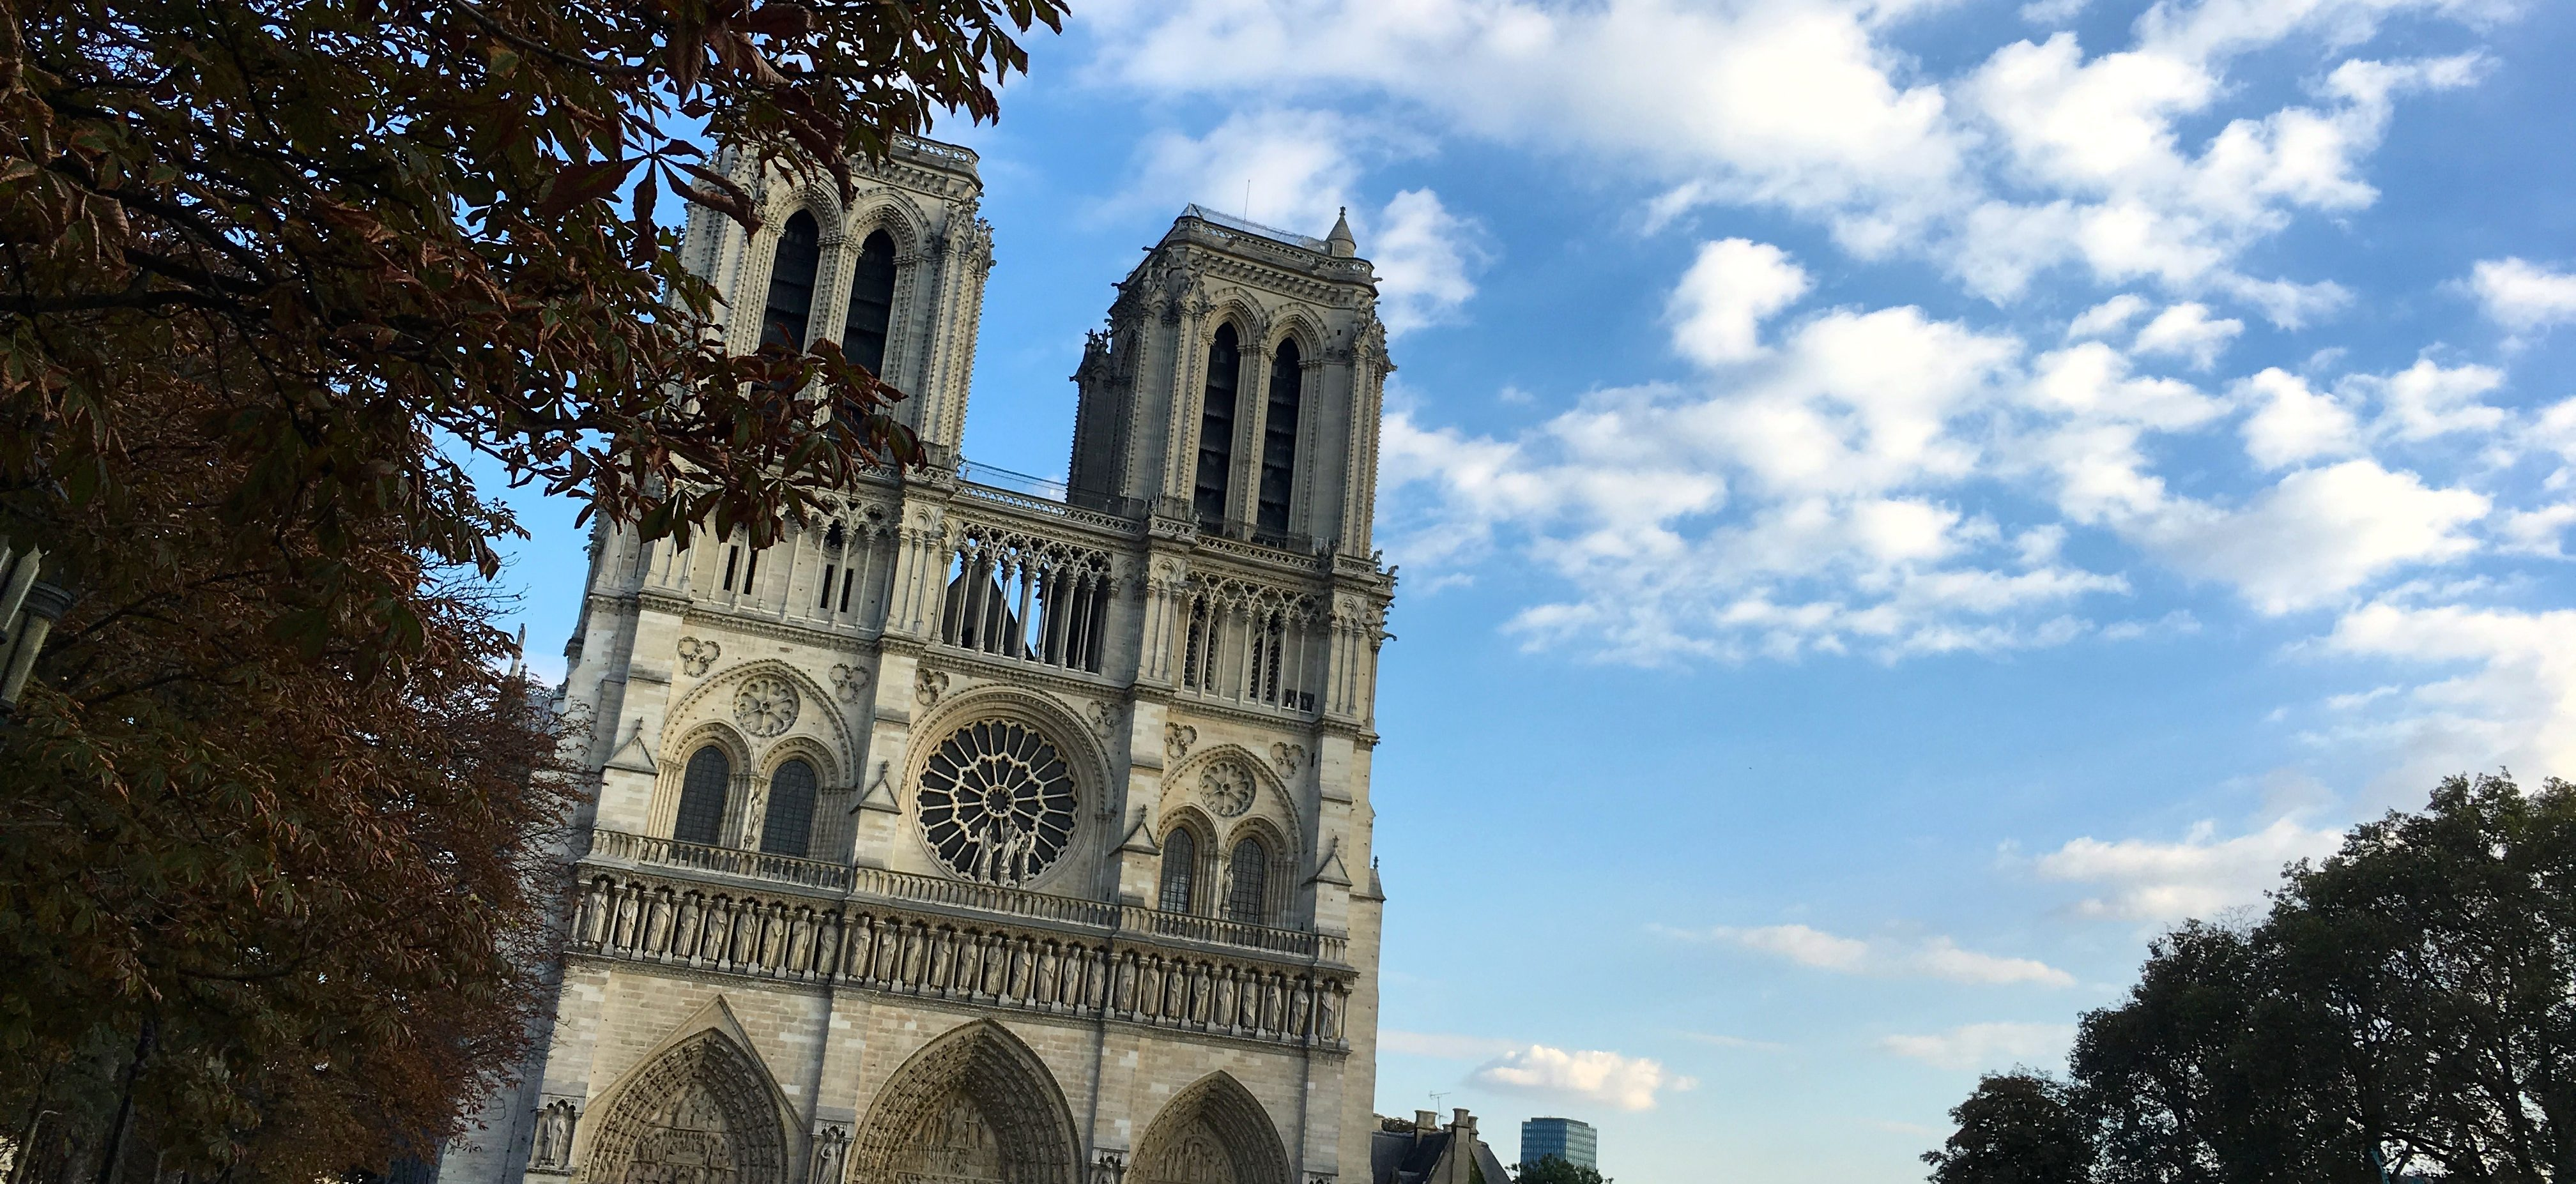 Notre Dame Paris France Deal Alert Fare War to Europe